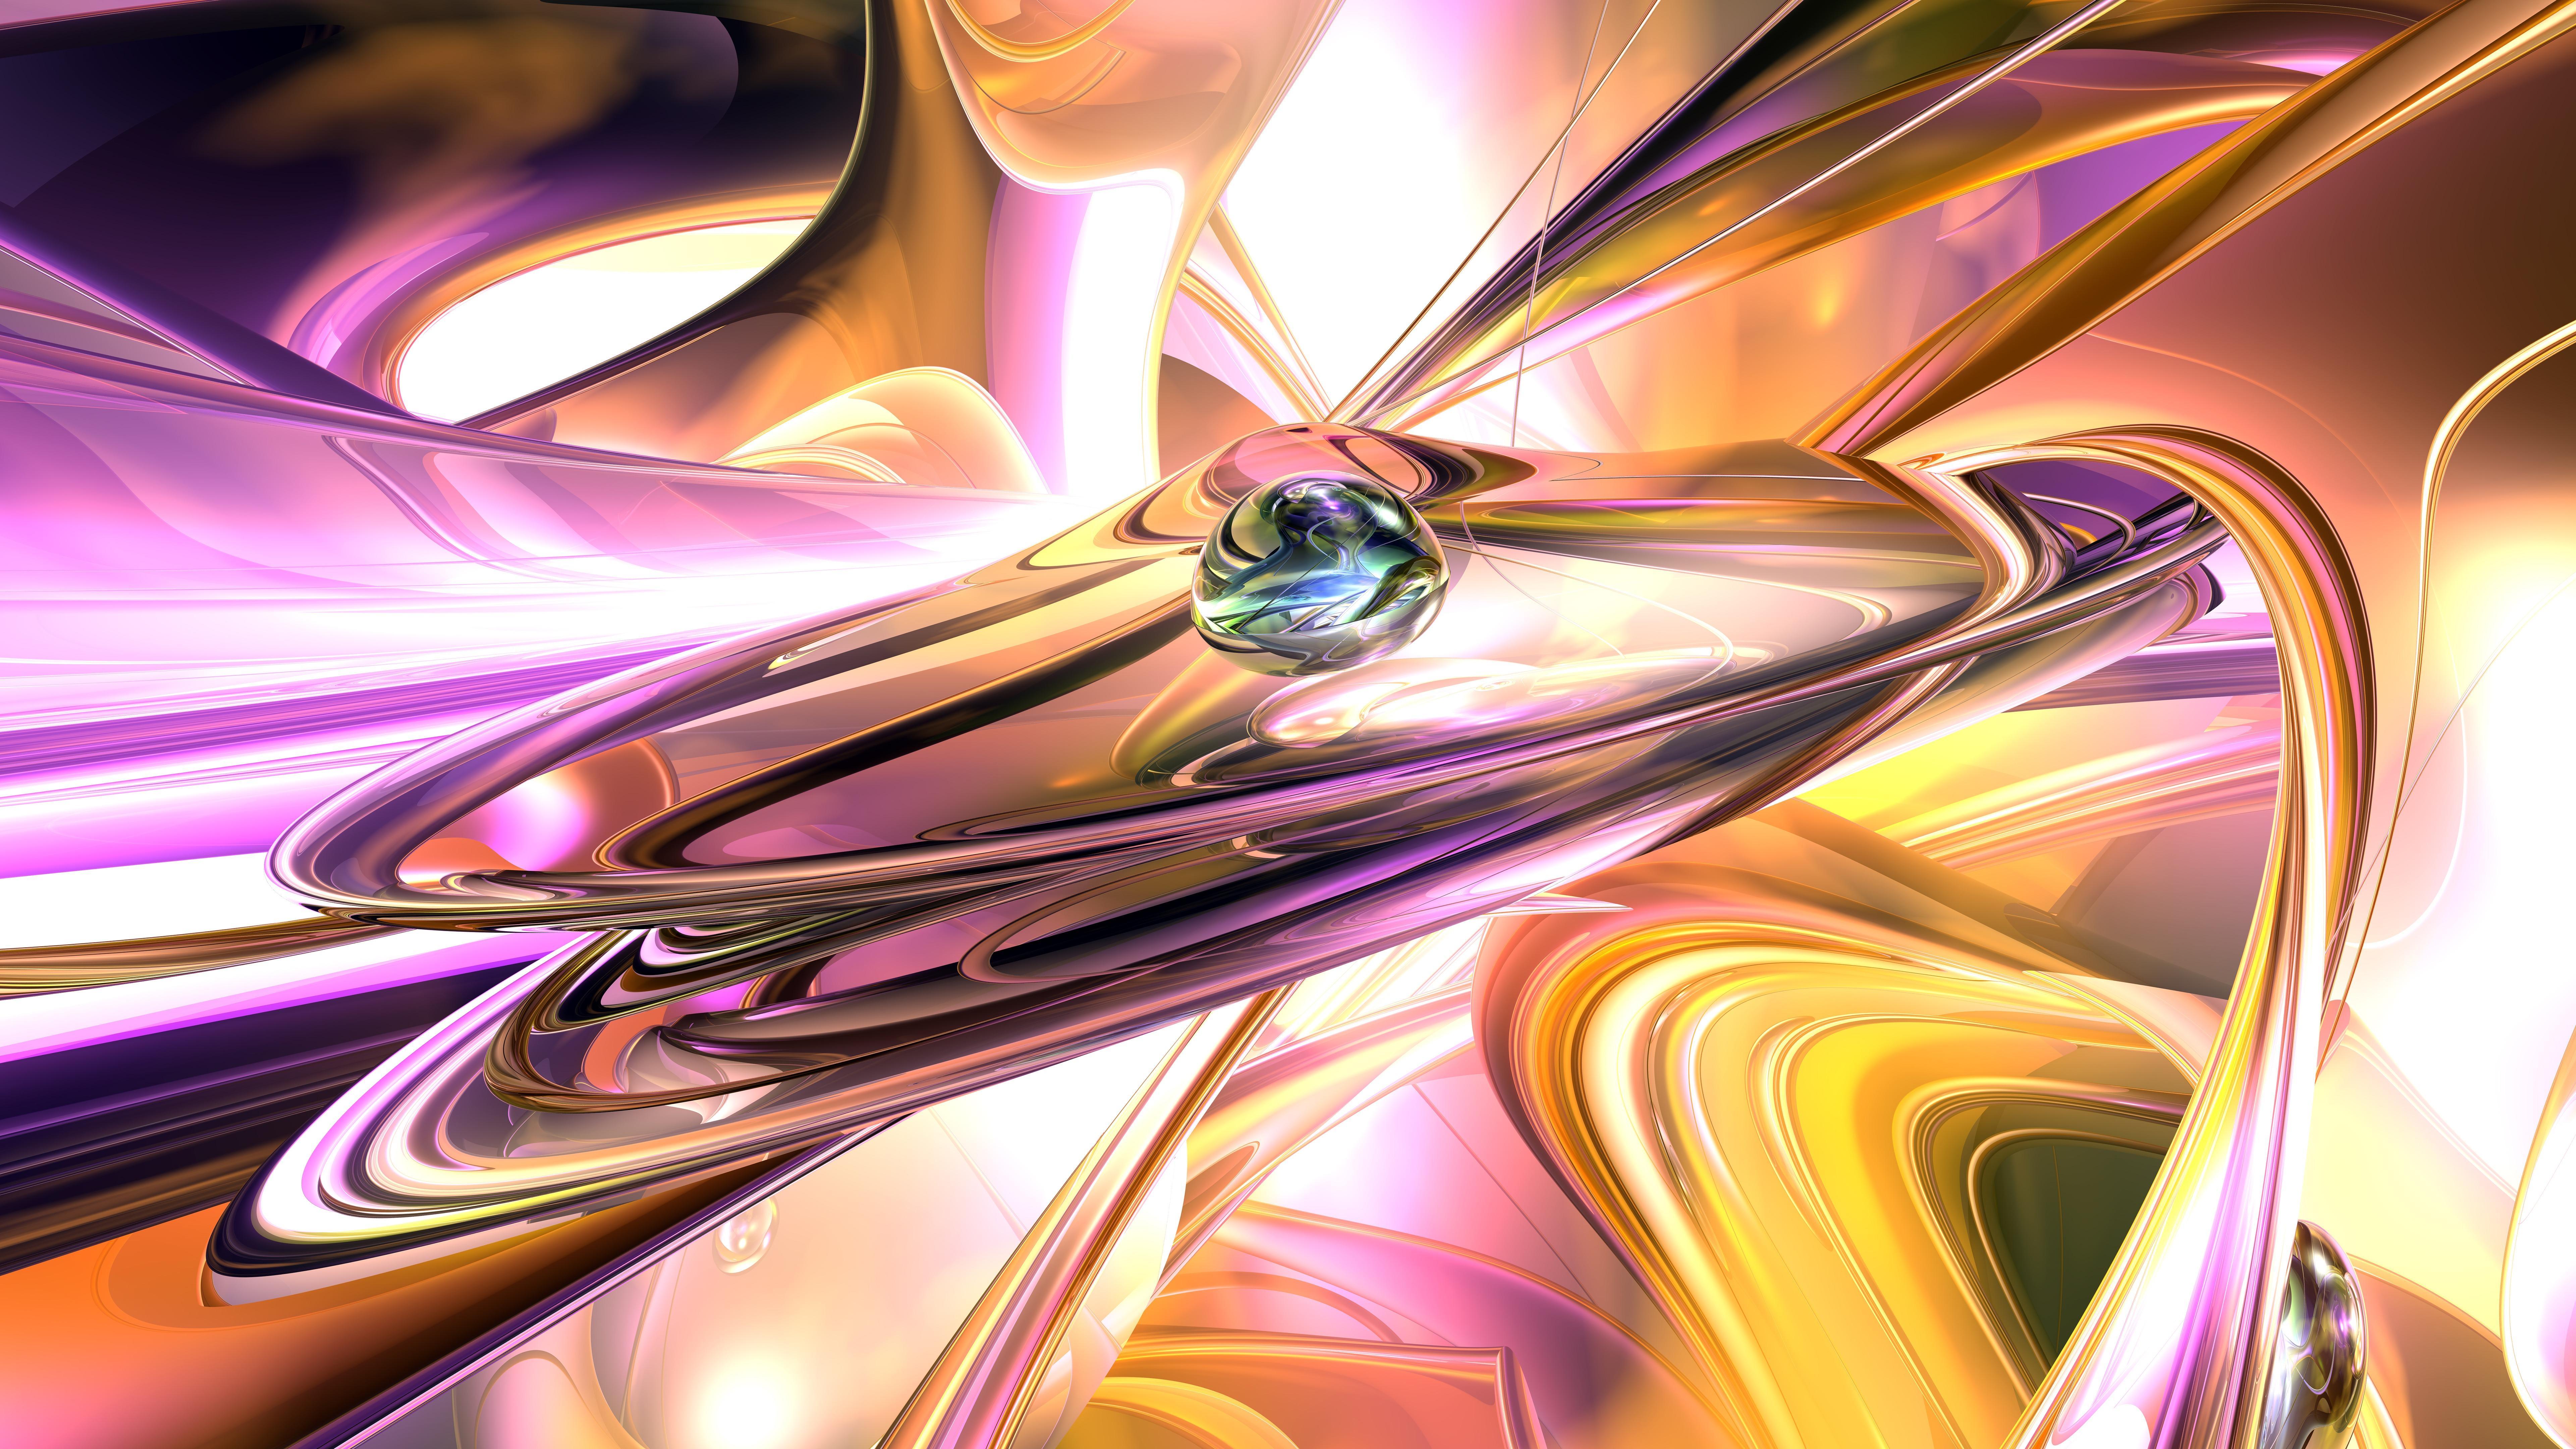 Pink futuristic digital abstract art wallpaper